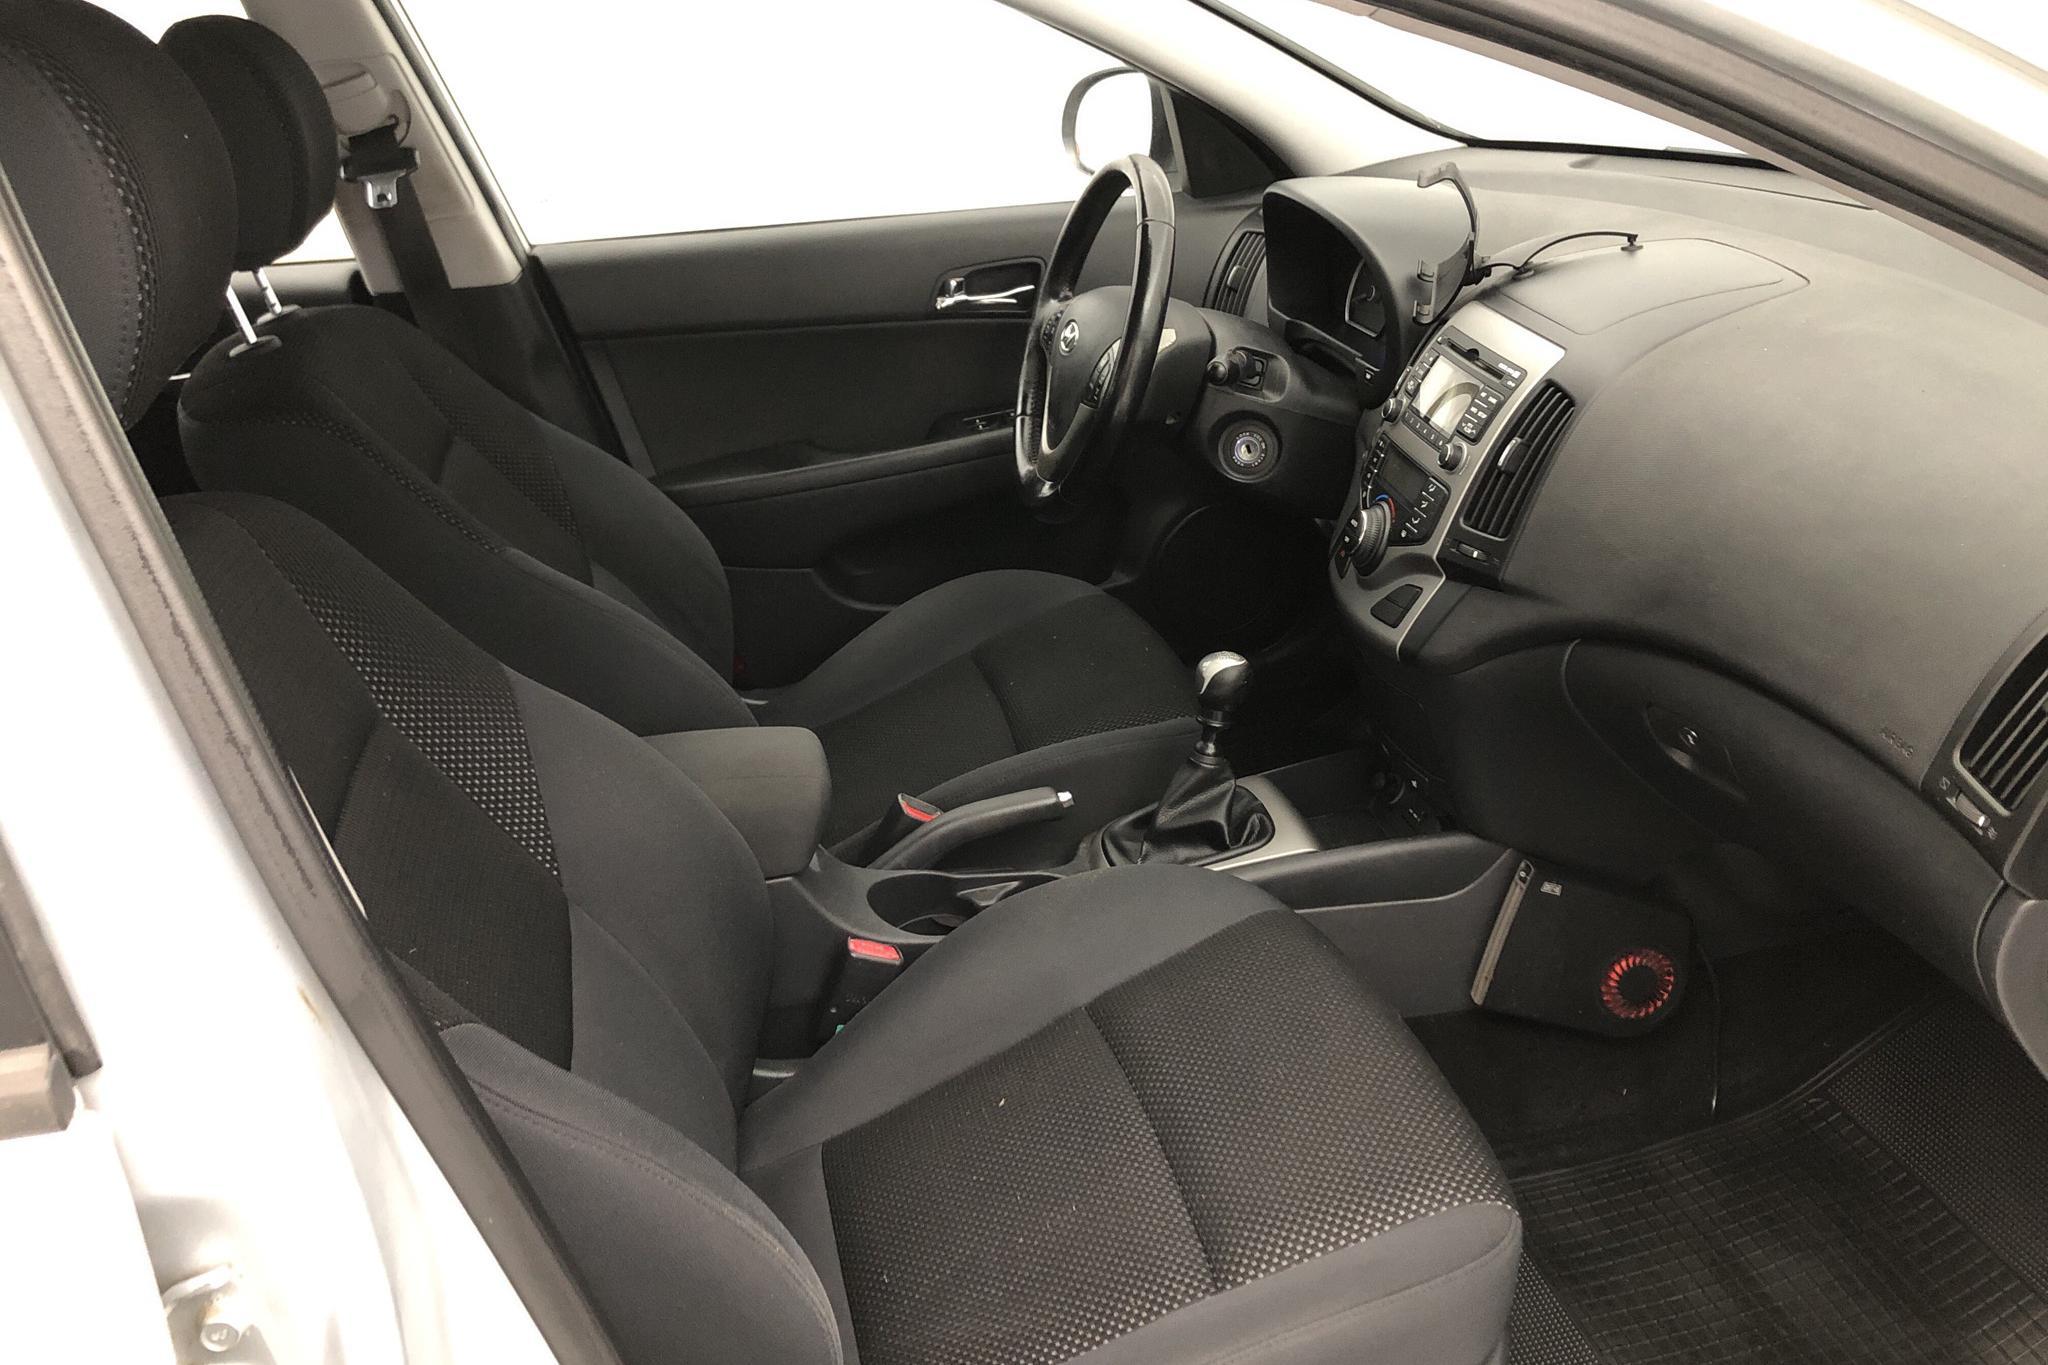 Hyundai i30 1.6 CRDi Kombi (115hk) - 25 914 mil - Manuell - silver - 2010